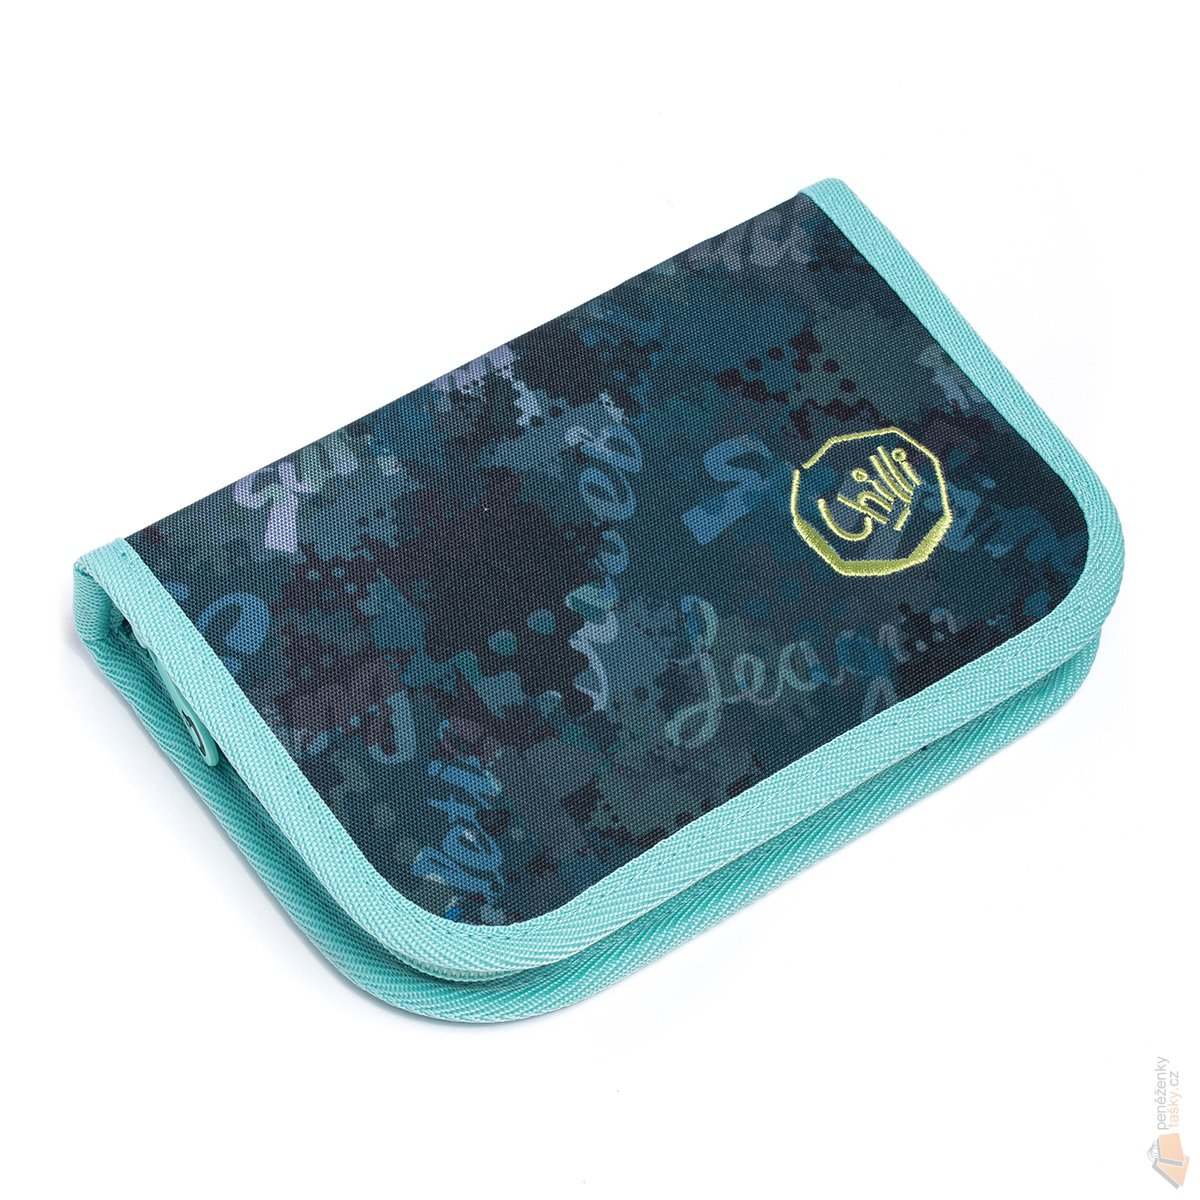 8d07475ca2b Topgal sada pro školáka set Small  Školní batoh CHI 878 D blue + ...